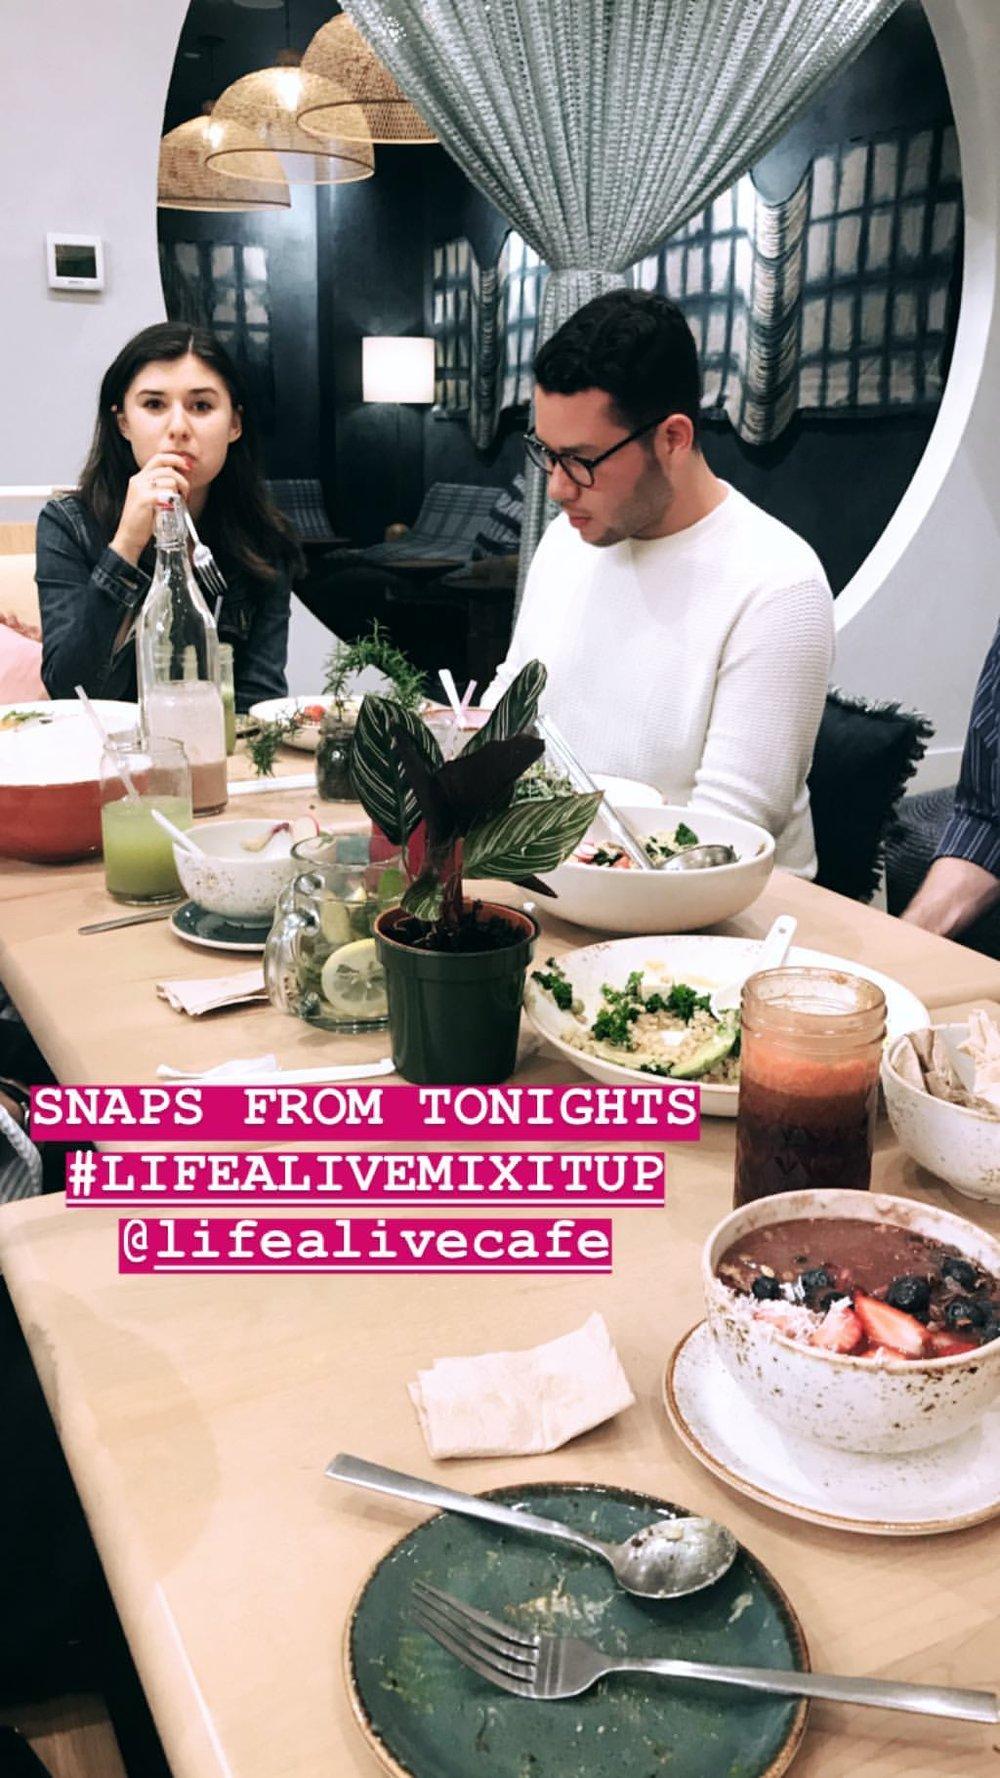 2018.09.20_anagoesfit, Instagram Story_Life Alive Brookline02.jpg